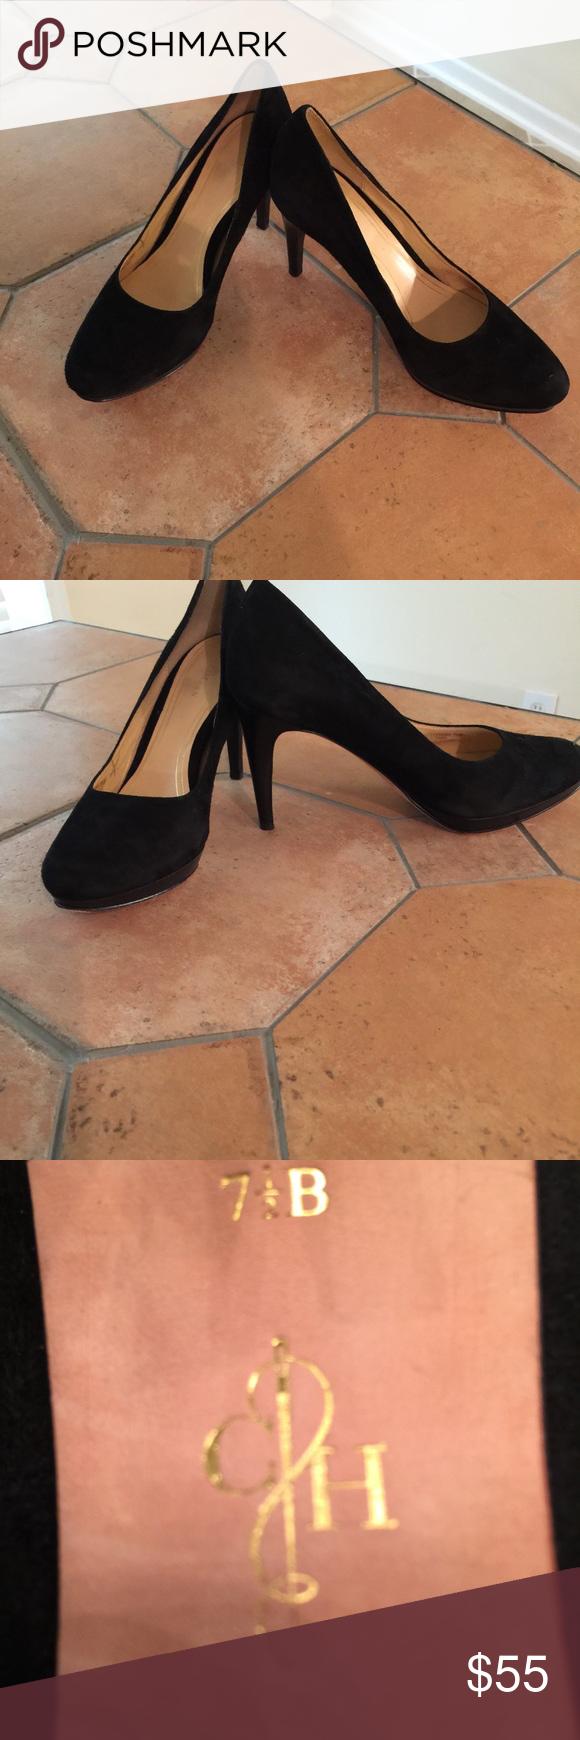 Cole Haan Black Suede  Platform Pumps Black suede platform Cole Haan pumps. Gently worn once. Nike Air insole and very omfortable.  Half inch platform and 3 inch heel. Excellent condition.  No box. Cole Haan Shoes Heels